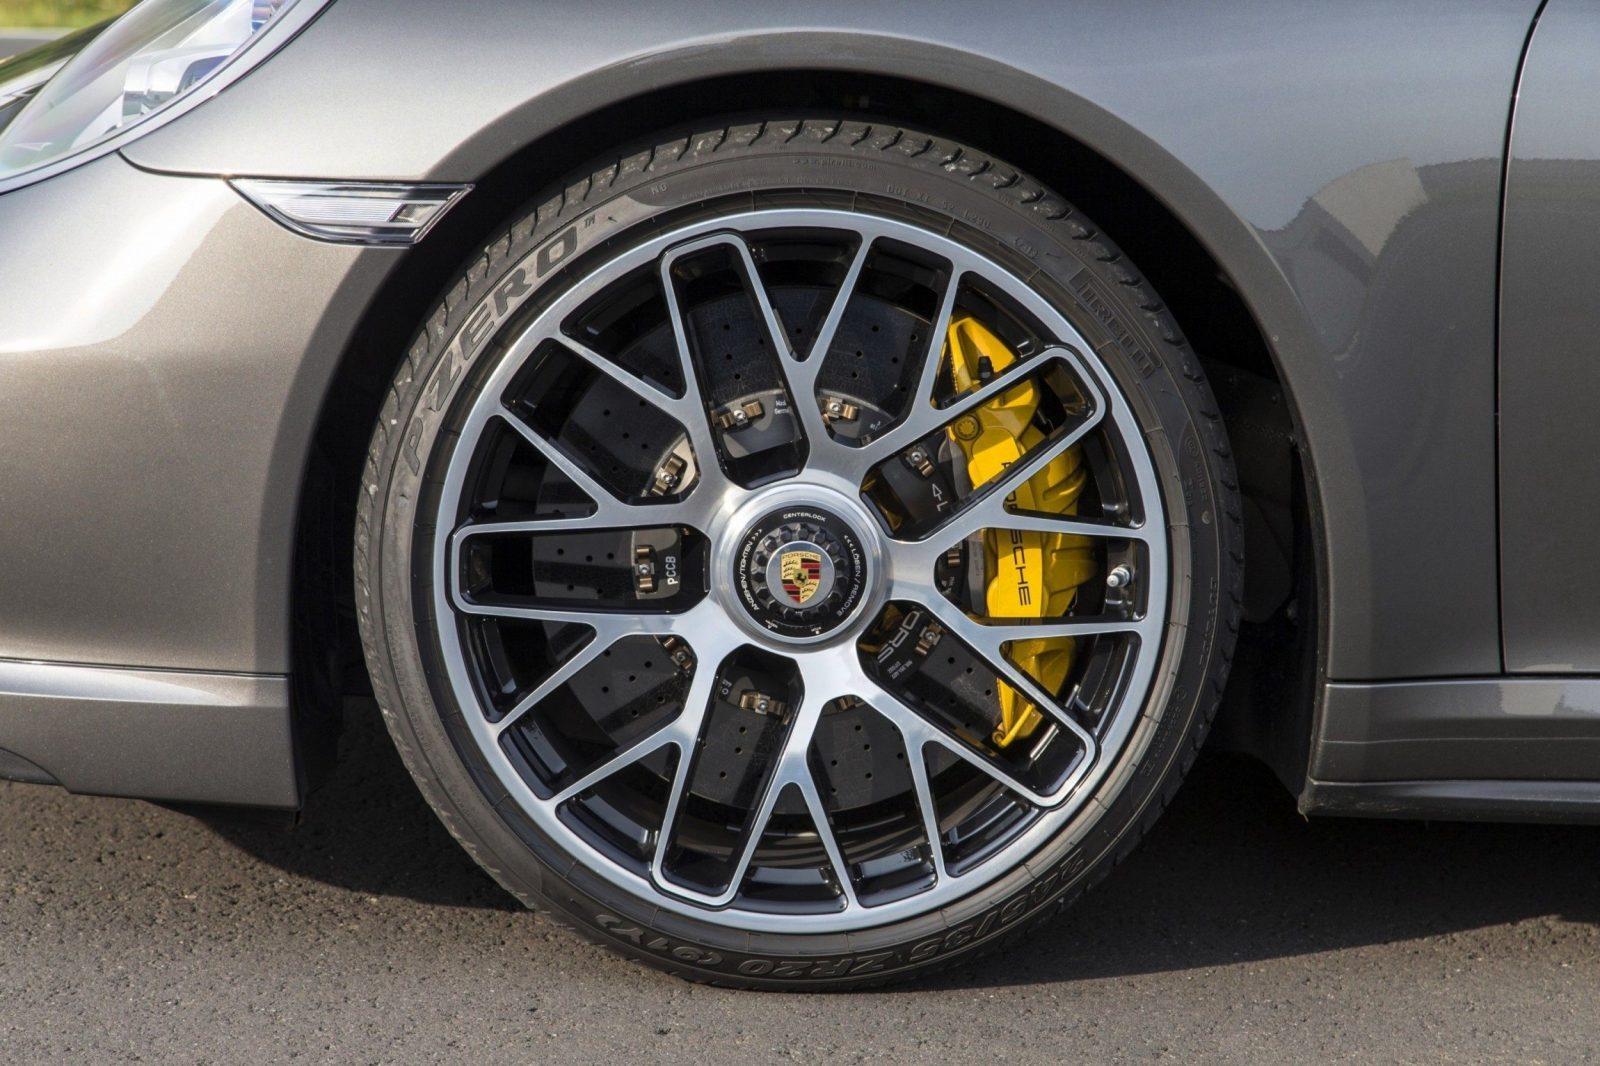 Porsche 911 Turbo S _32_